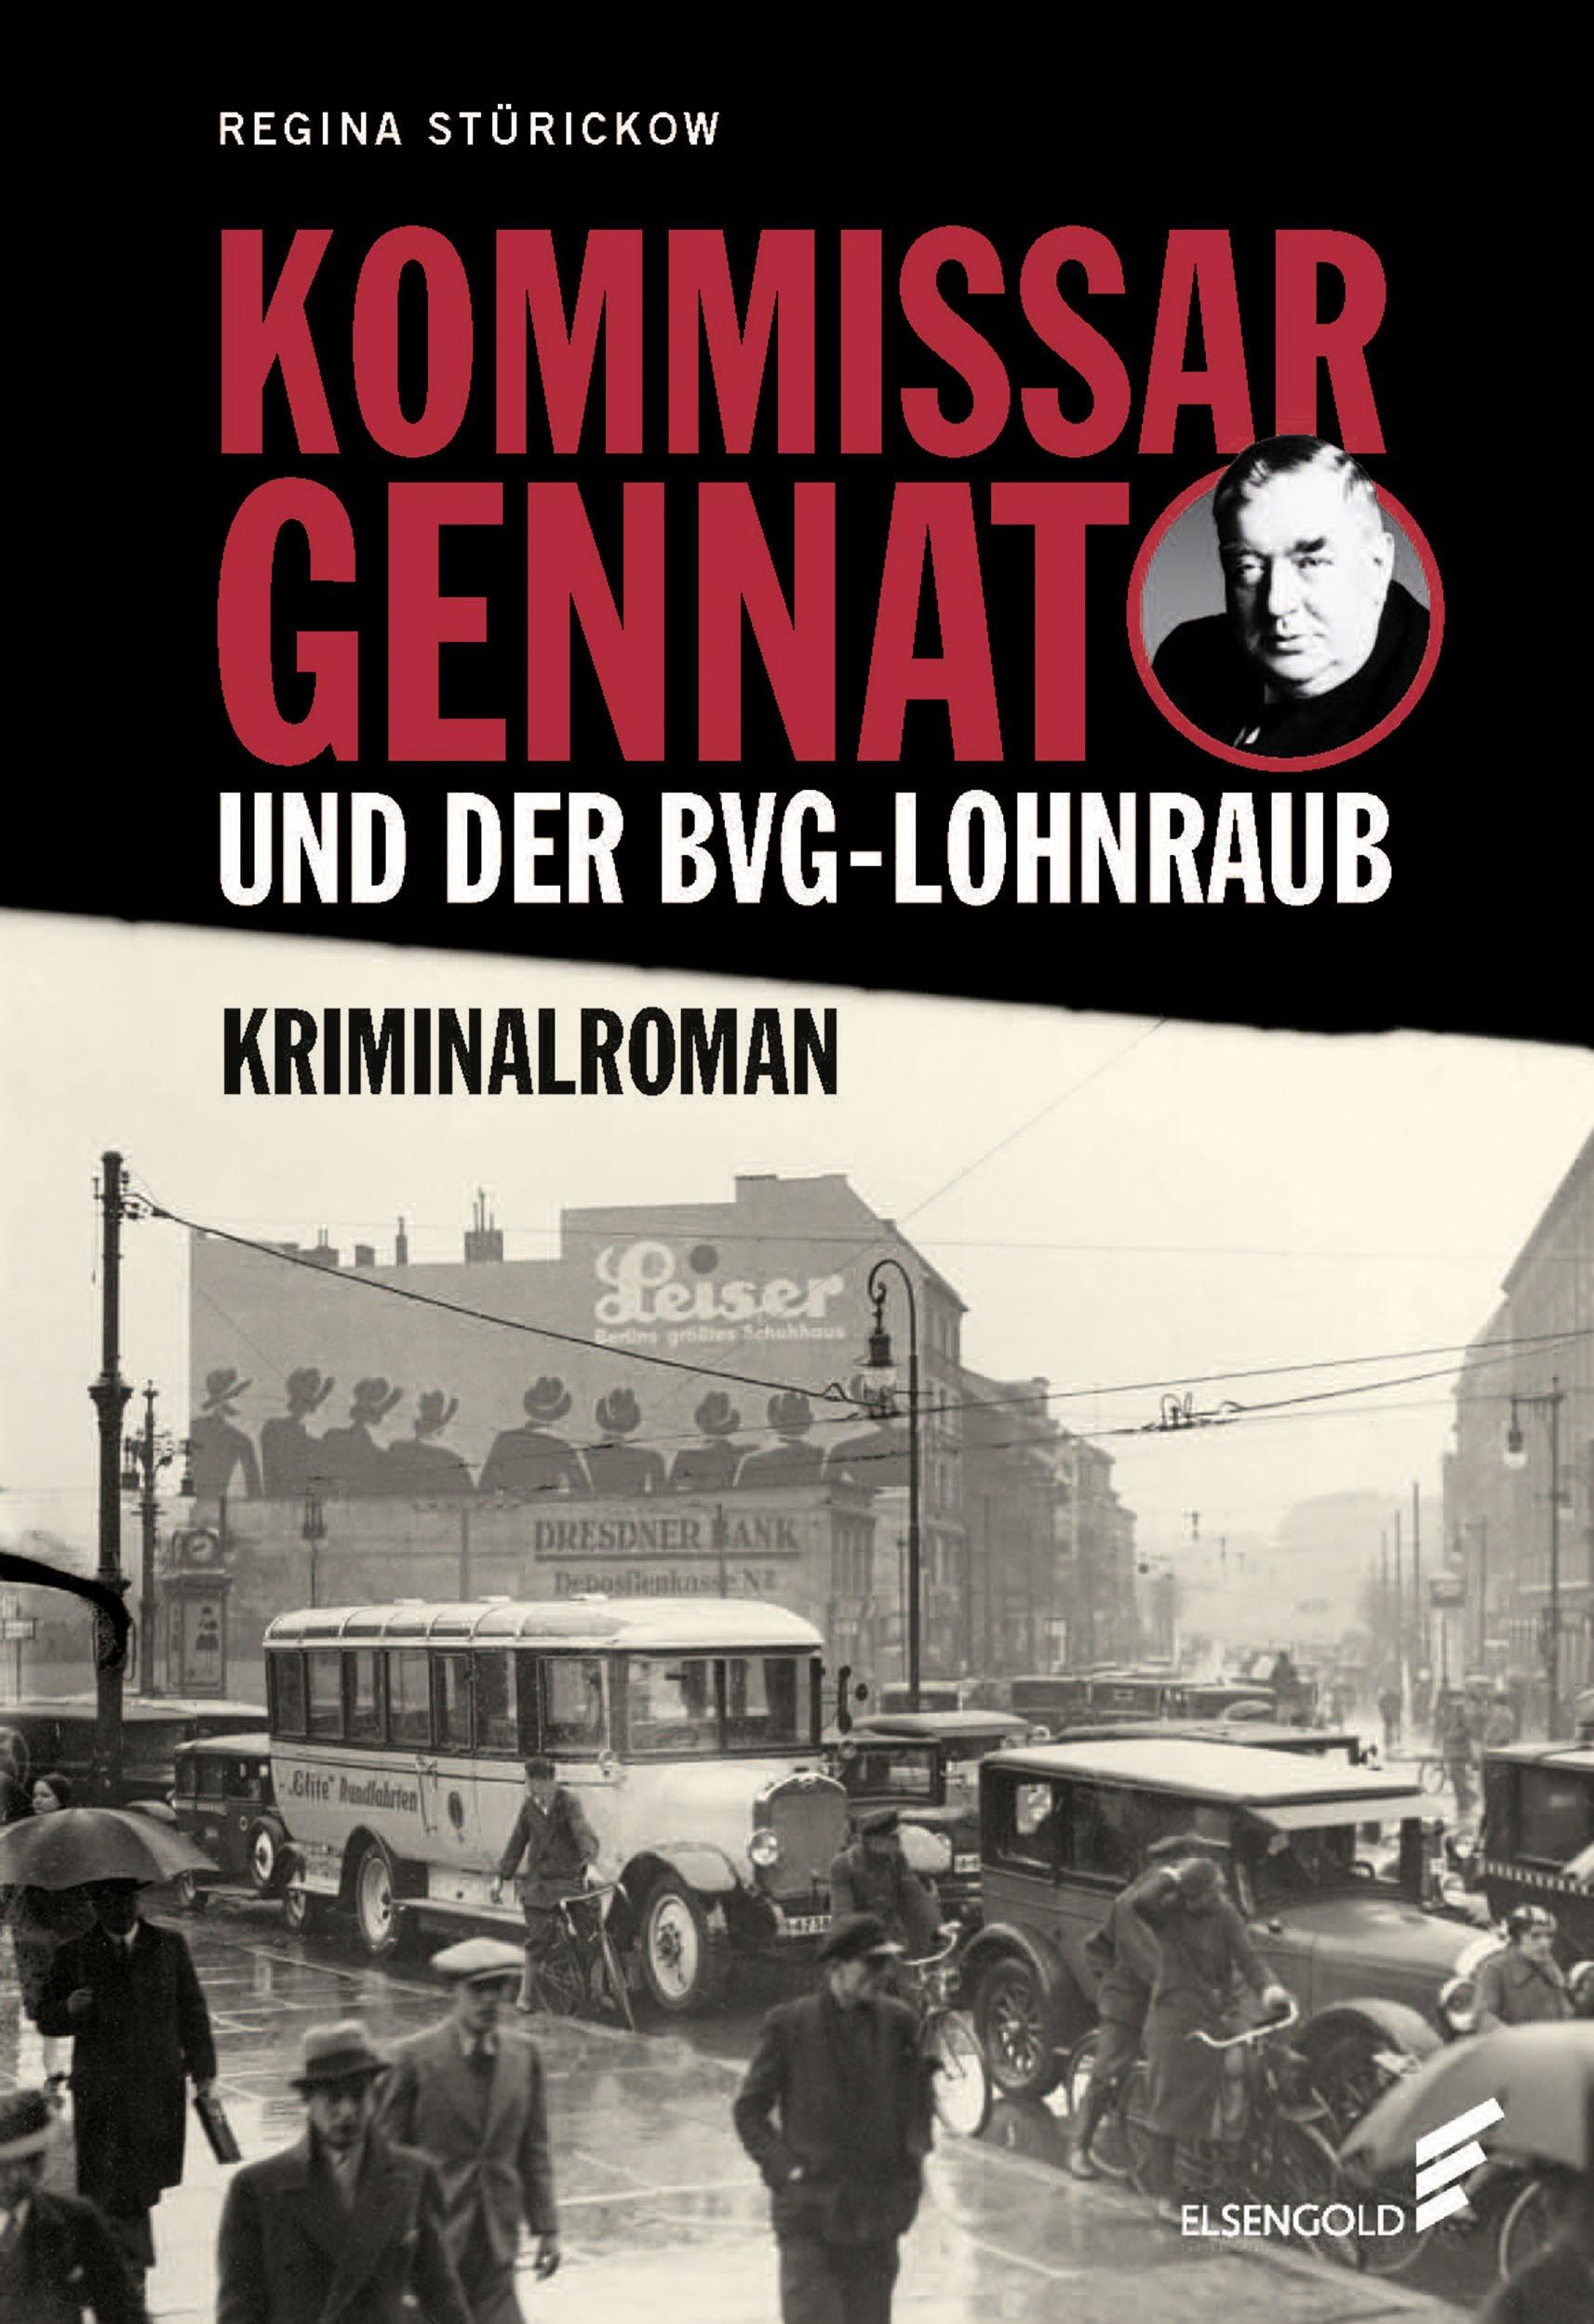 Gennat Berlin Krimi Roman Stürickow